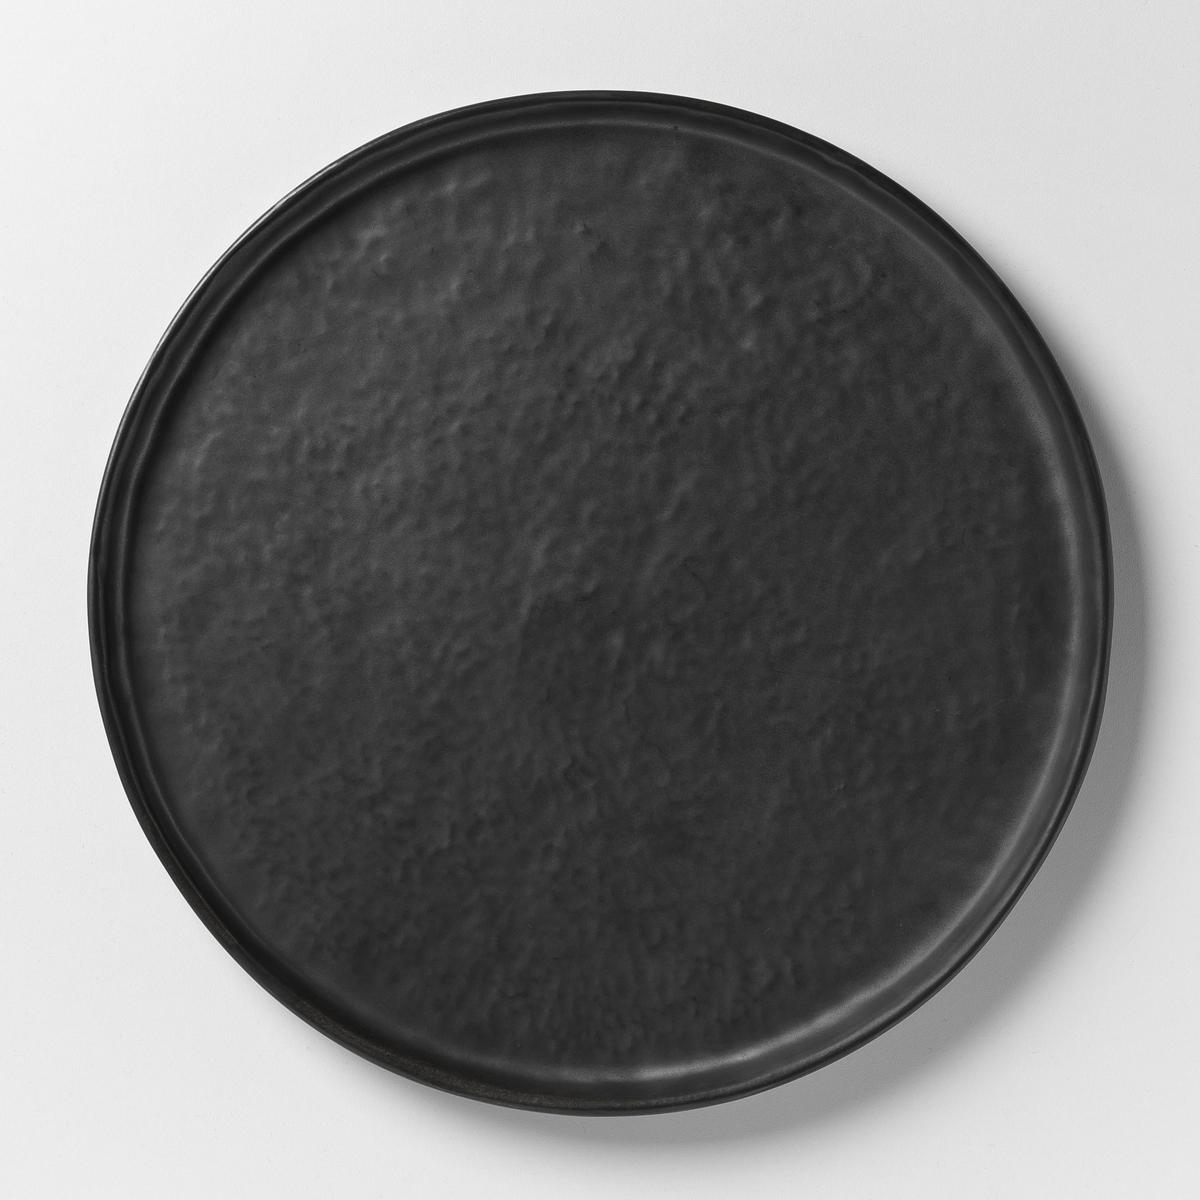 Тарелка плоская из керамики Pure design P .Нессенса, Serax от La Redoute